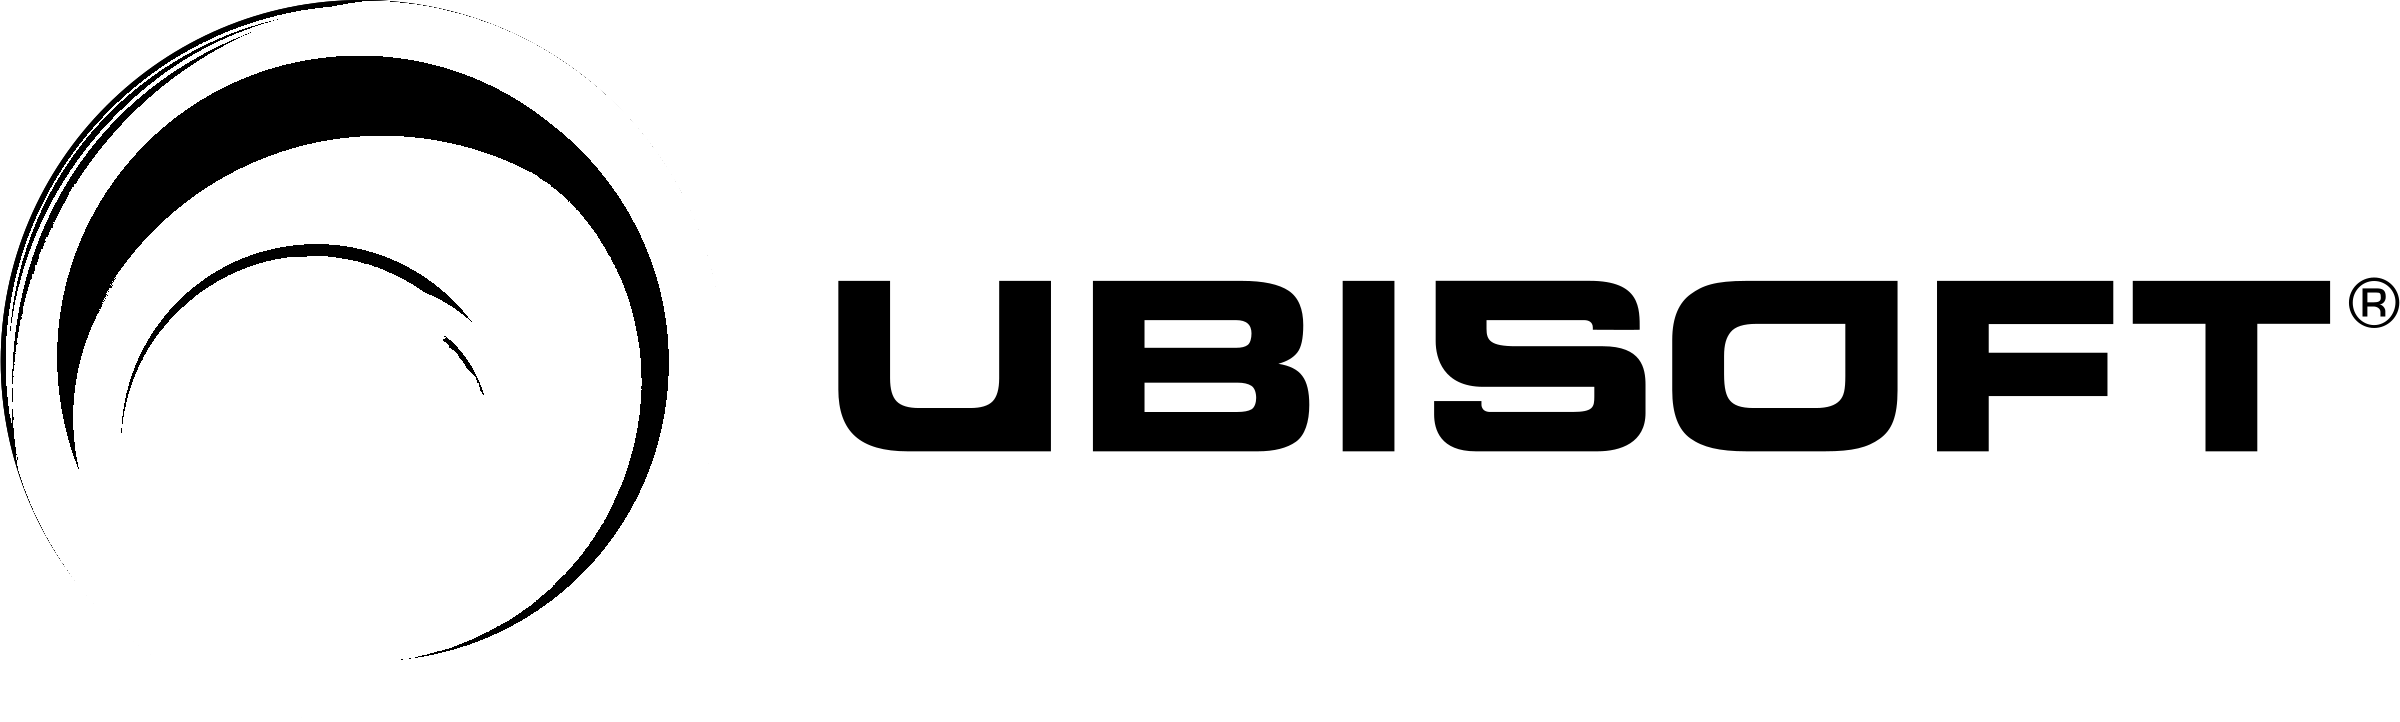 Ubisoft Logo PNG Transparent & SVG Vecto #719146.